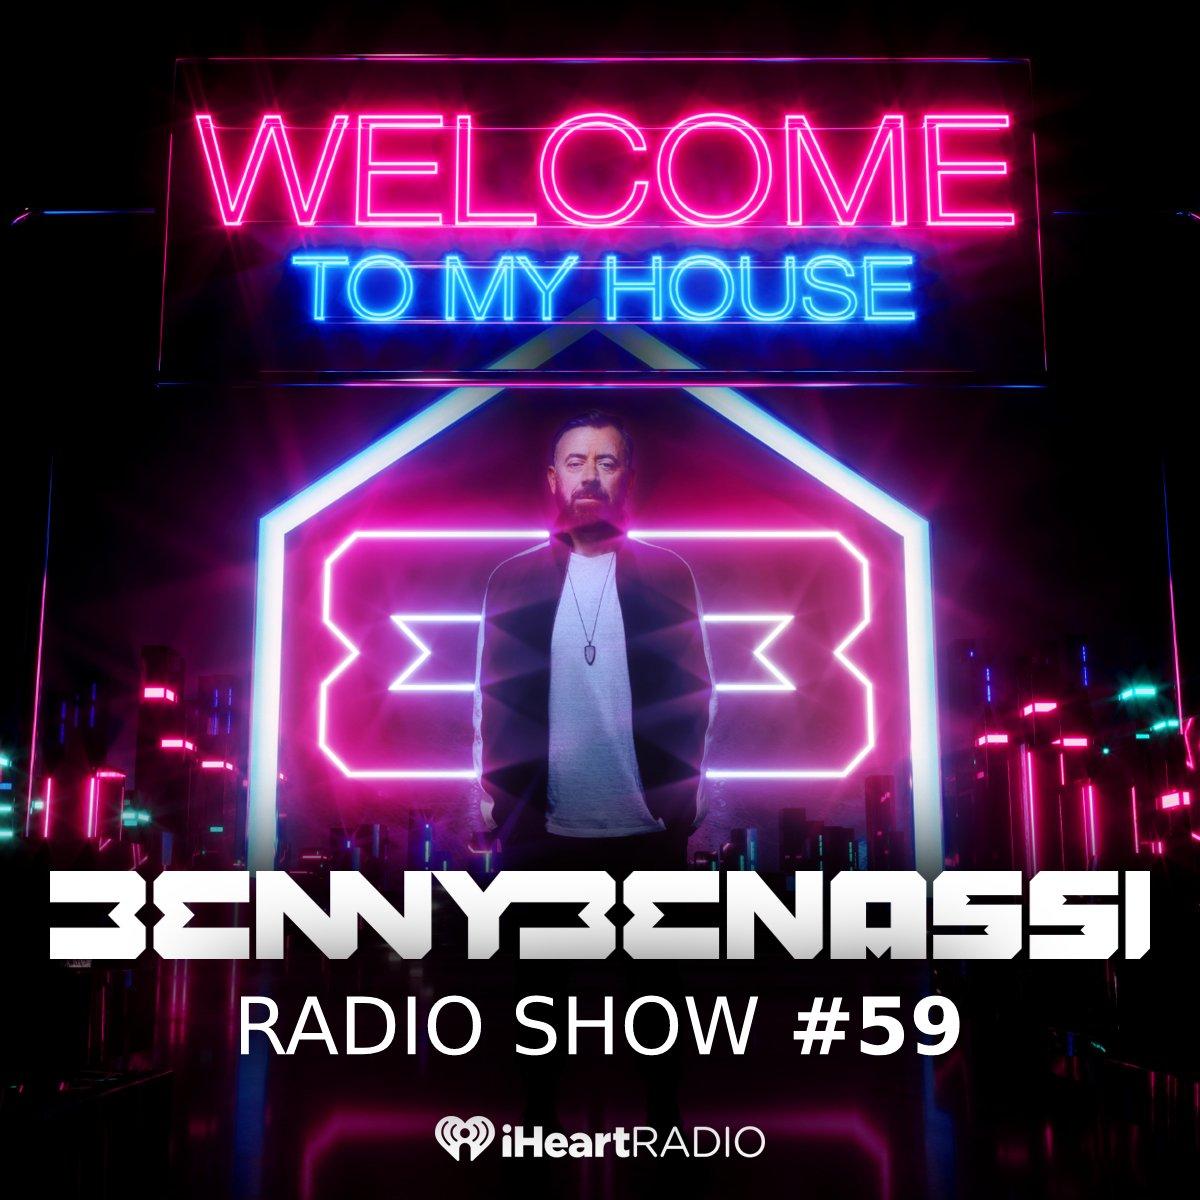 Benny Benassi - Welcome To My House - Radio Show #59 [DAB-01-19-2019] (2019) .mp3 -215 Kbps